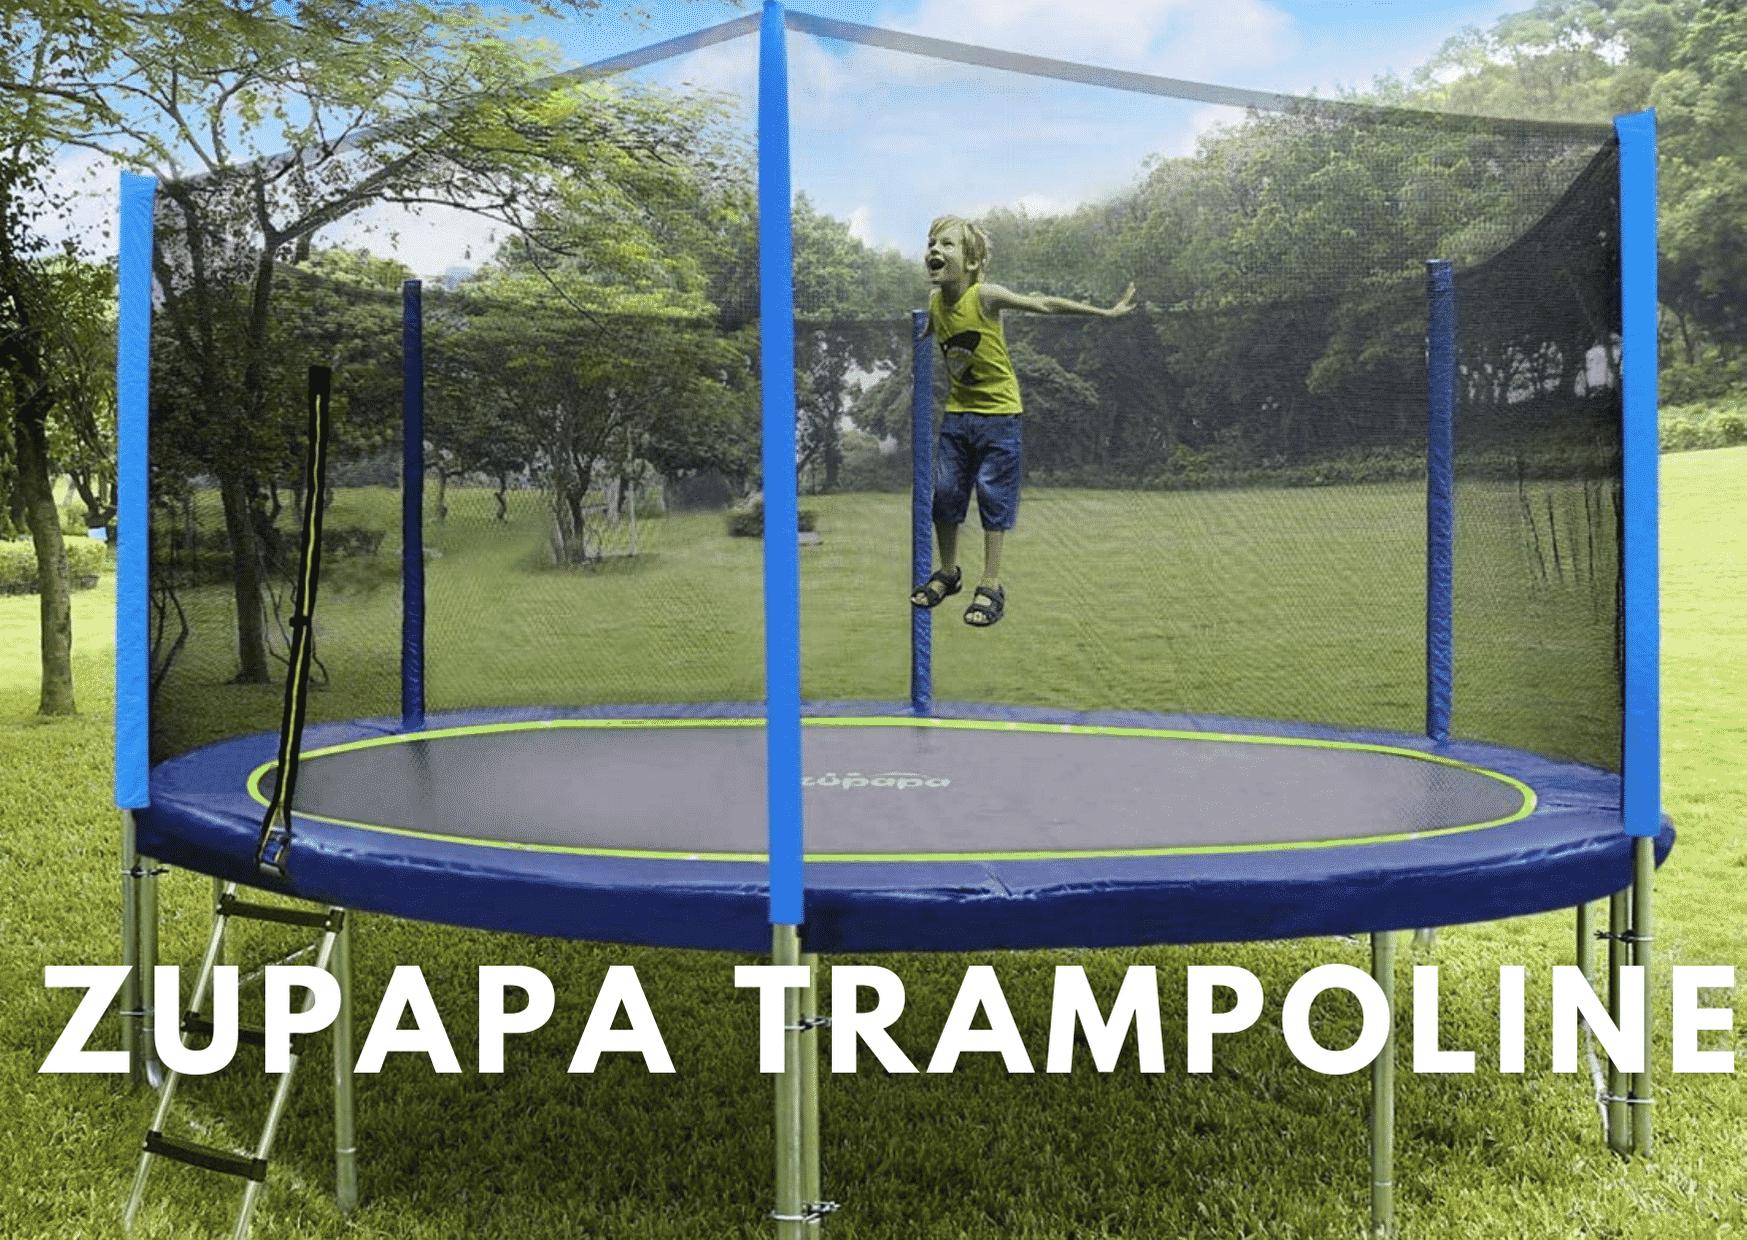 zupapa trampoline reviews